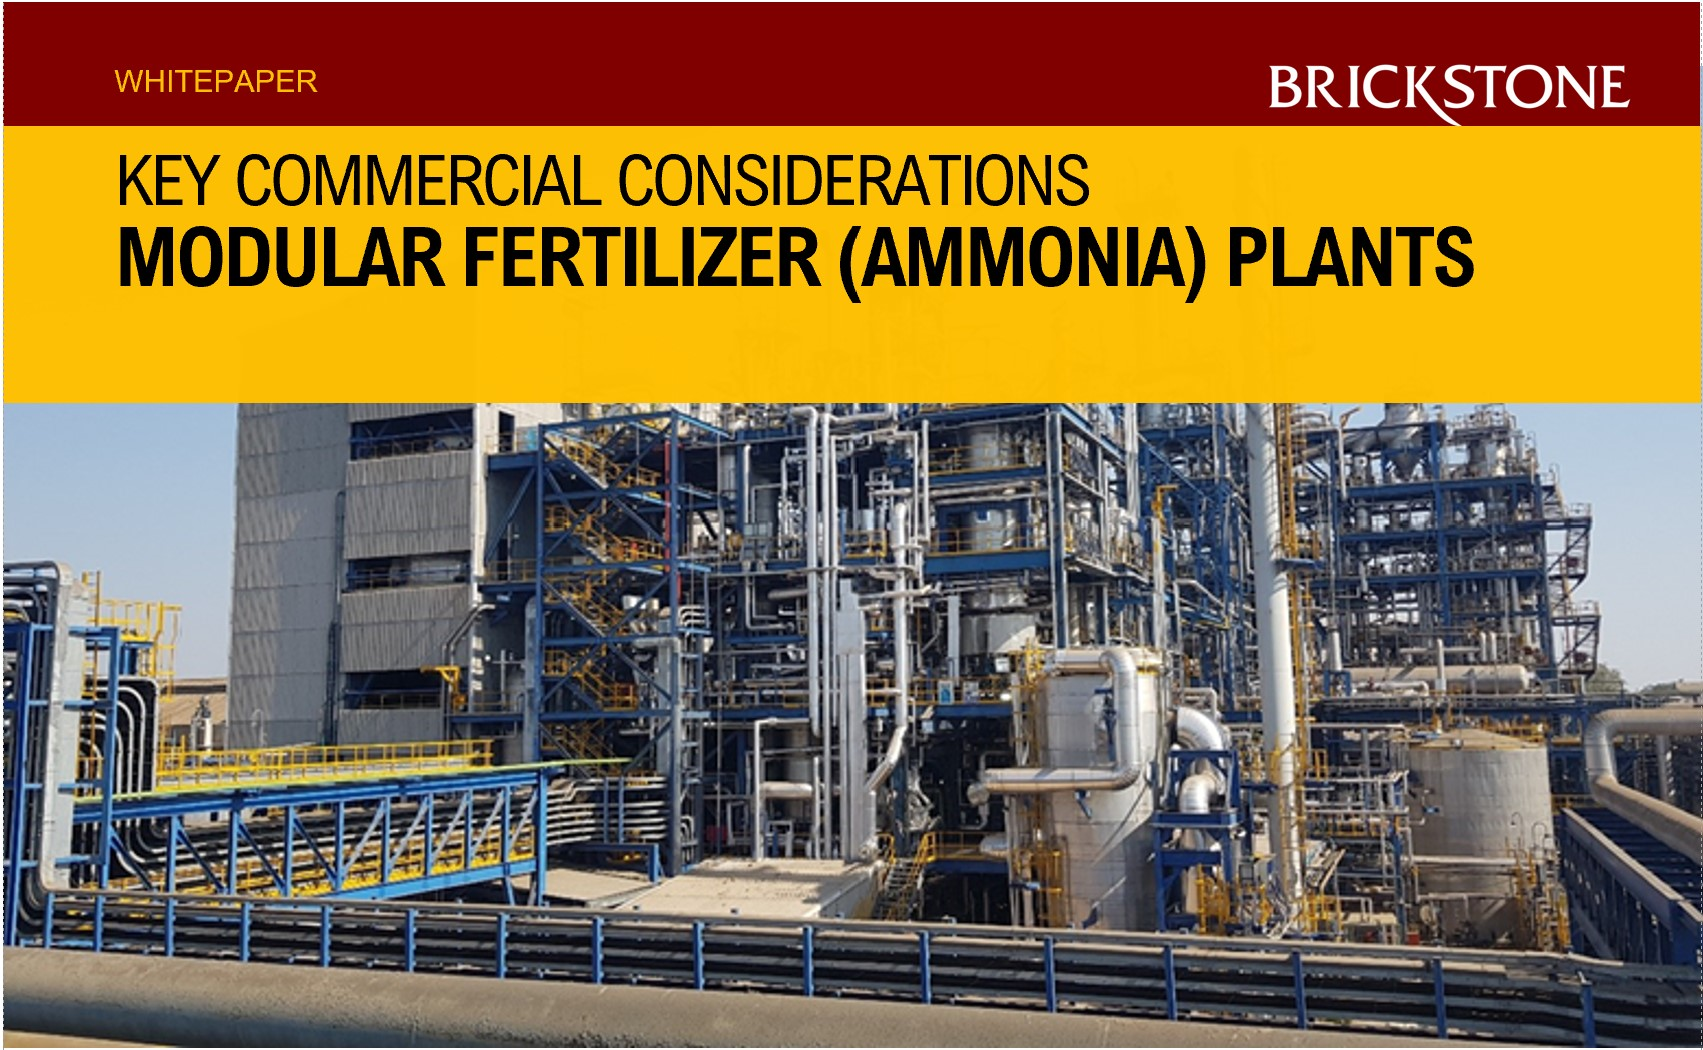 Modular Fertilizer Plants